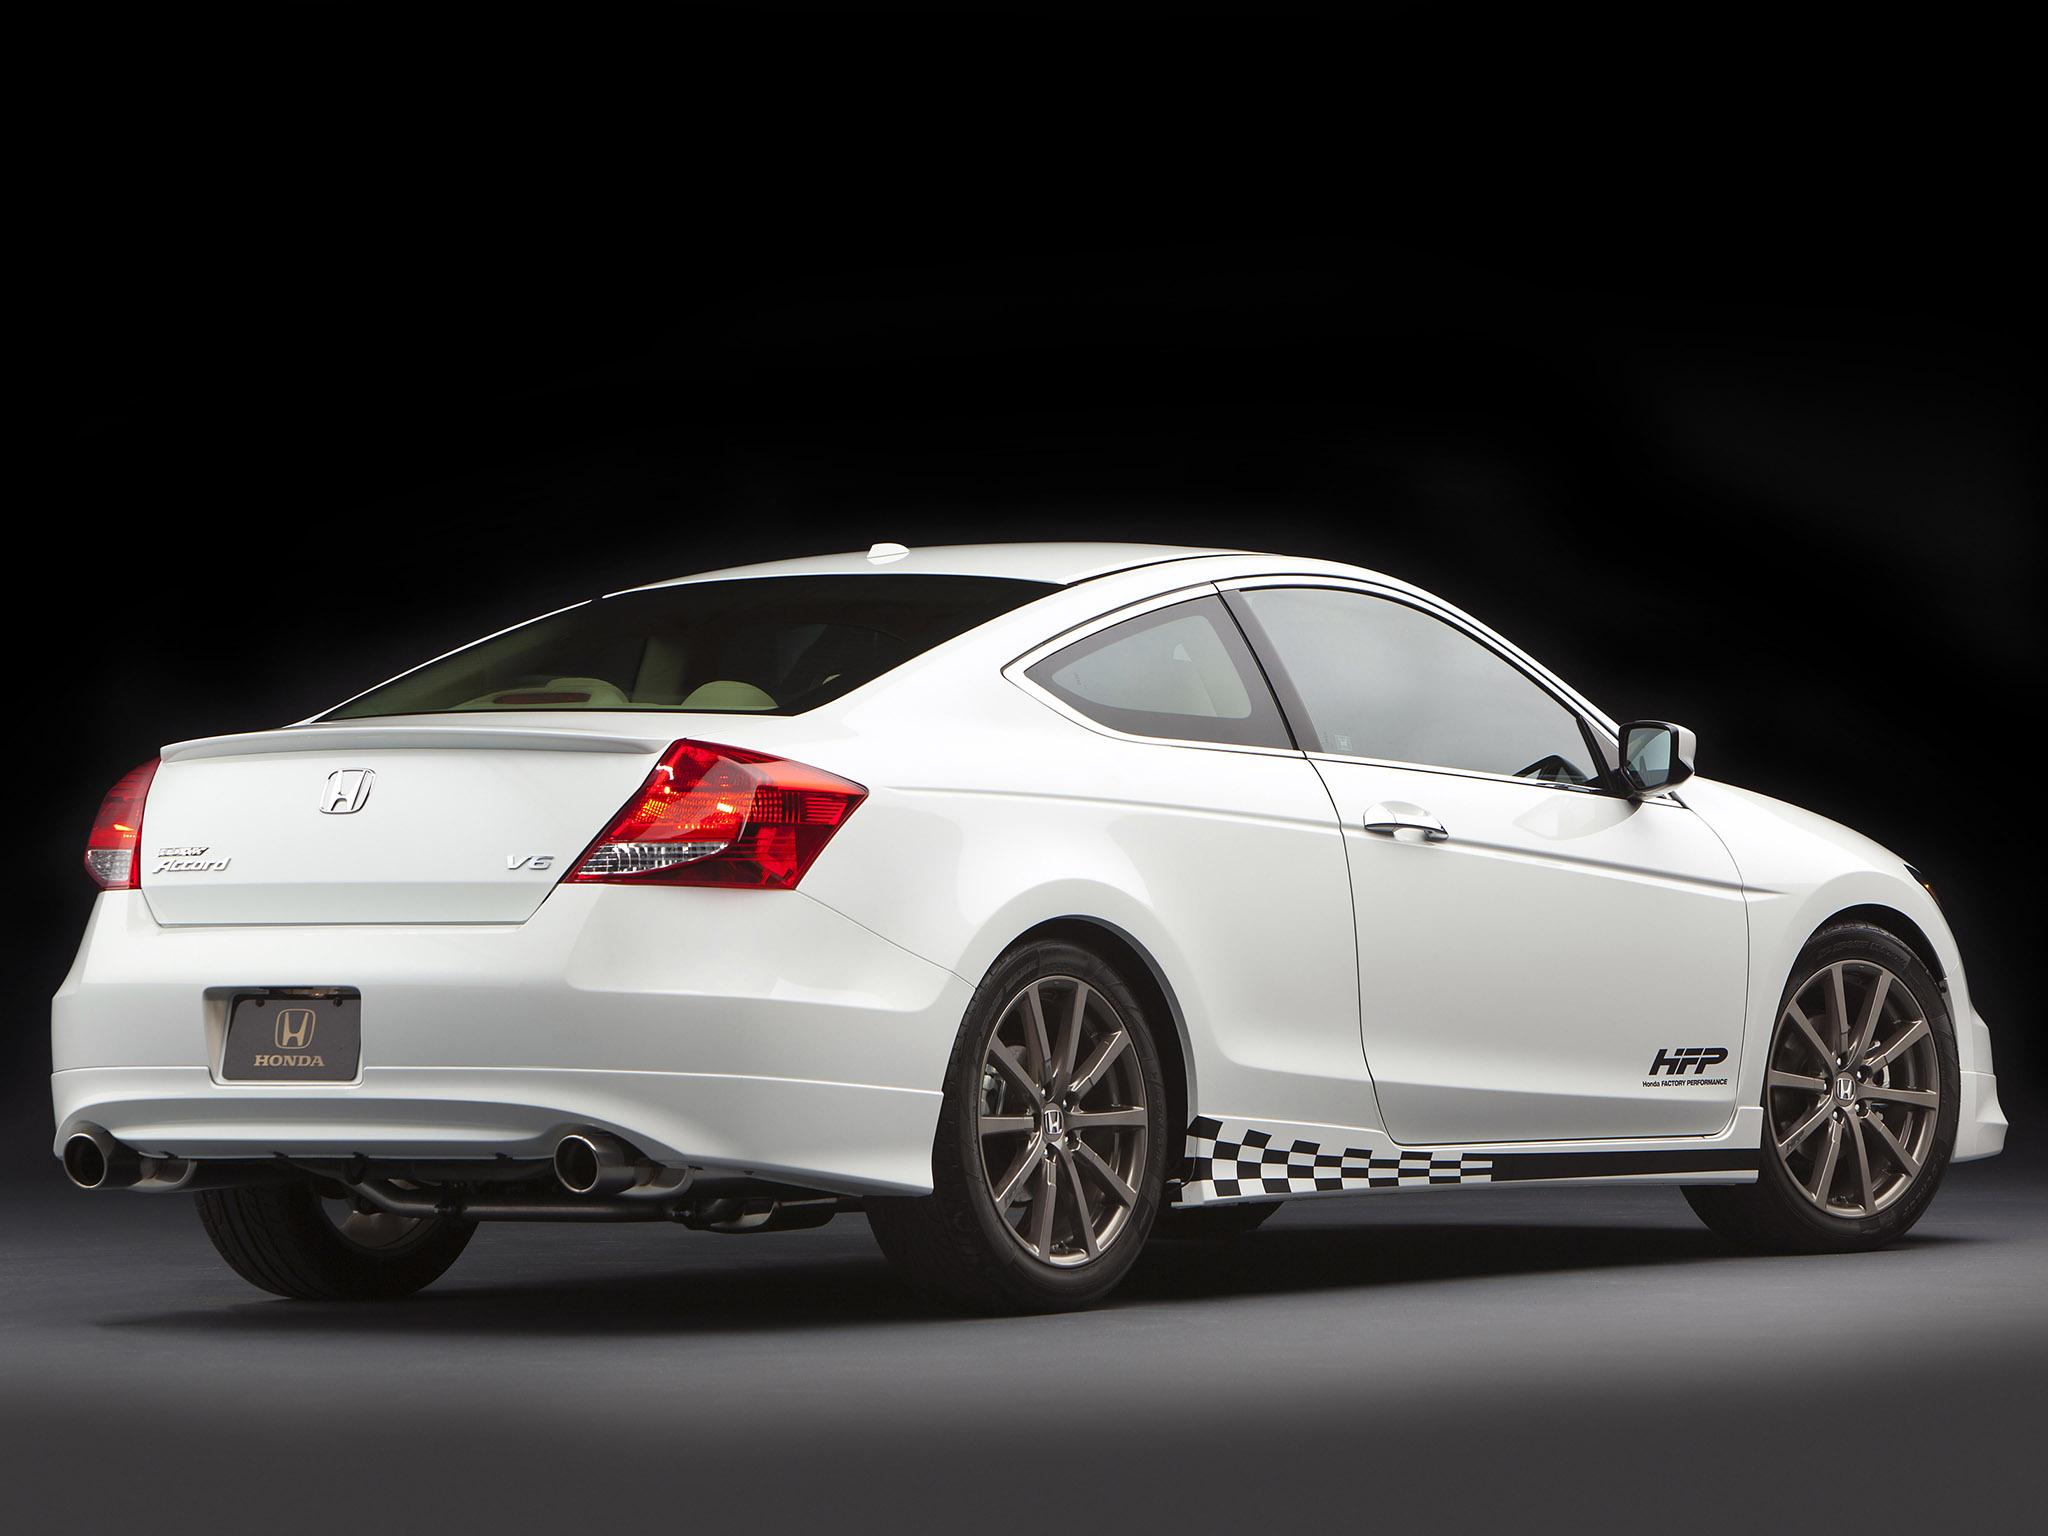 Honda Accord Coupe V6 Concept 2011 Honda Accord Coupe V6